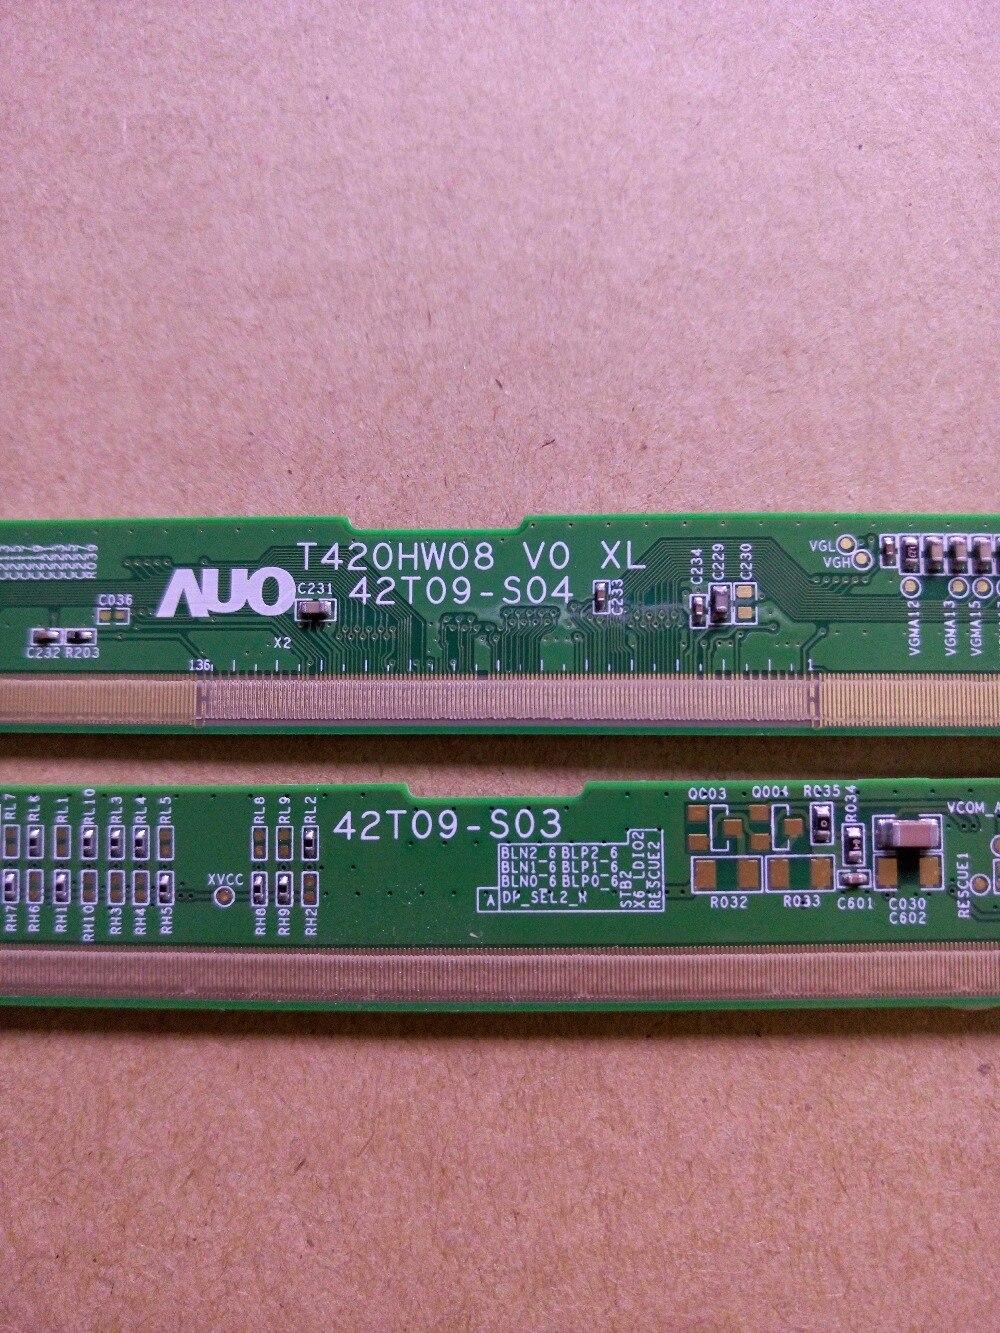 T420HW08 V0 XL/XR 42T09-S04/42T09-S03 LCD Panel PCB Part A Pair